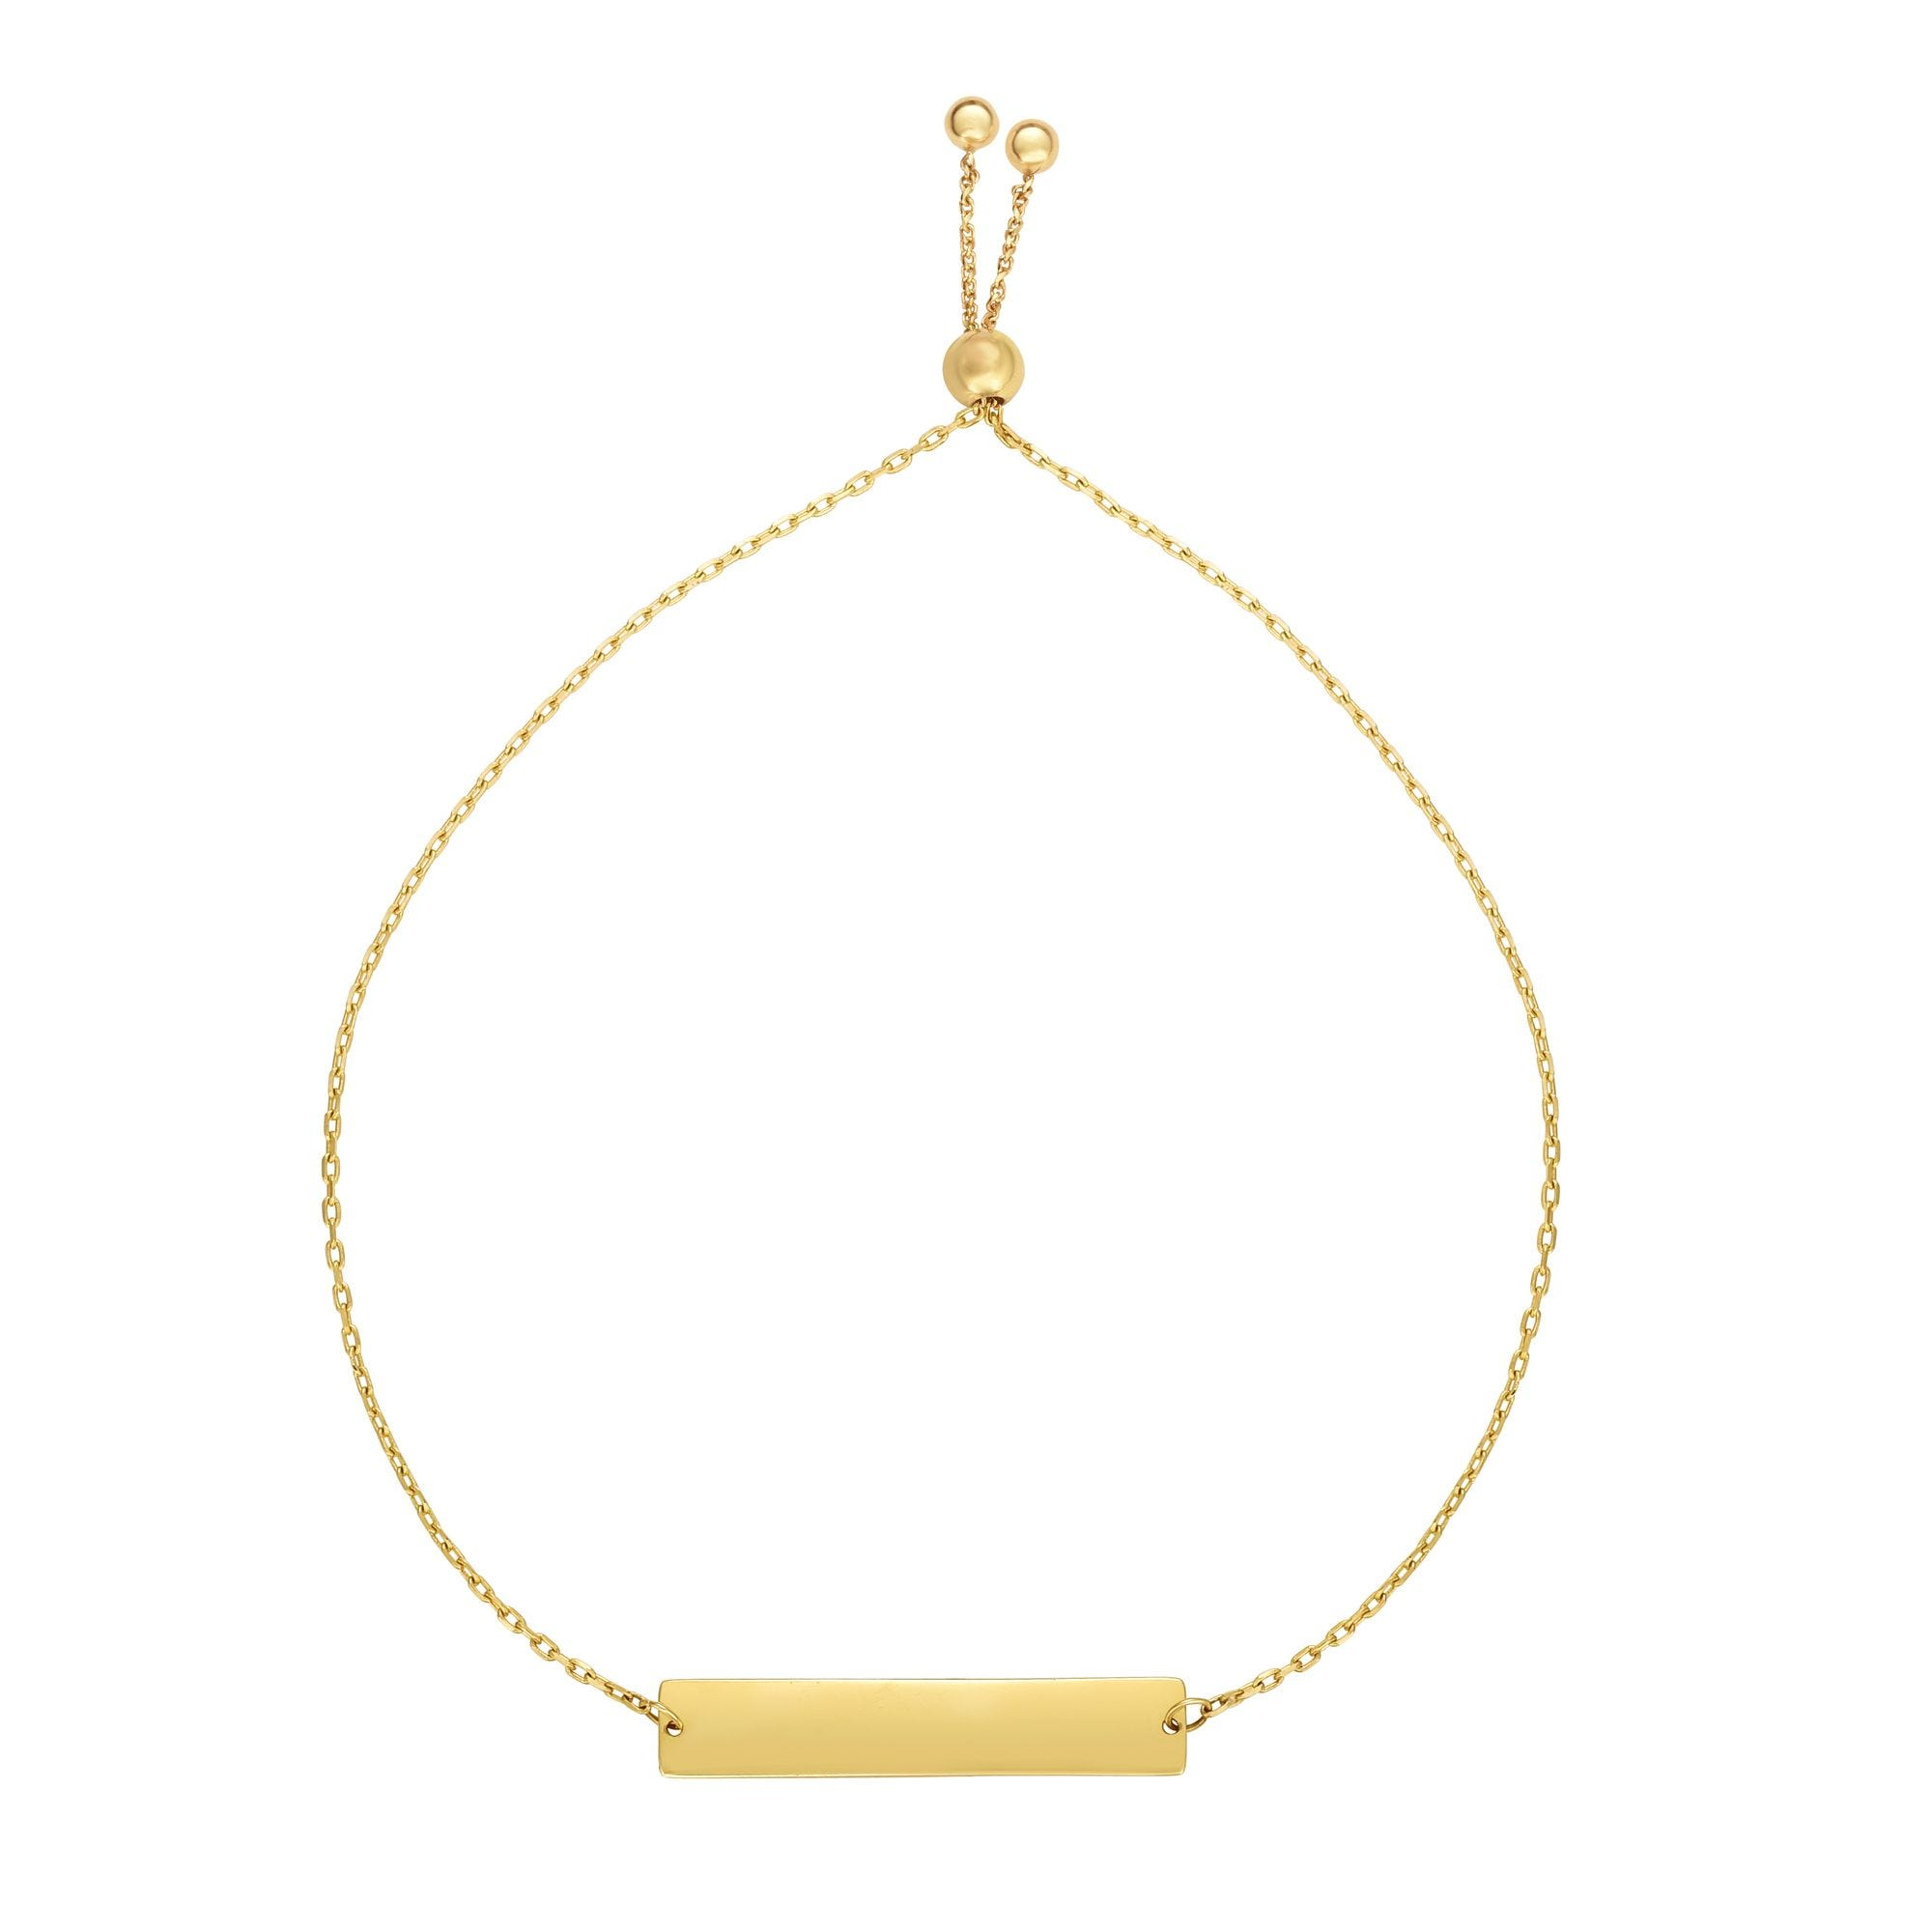 Bar Bracelet in 14k Yellow Gold